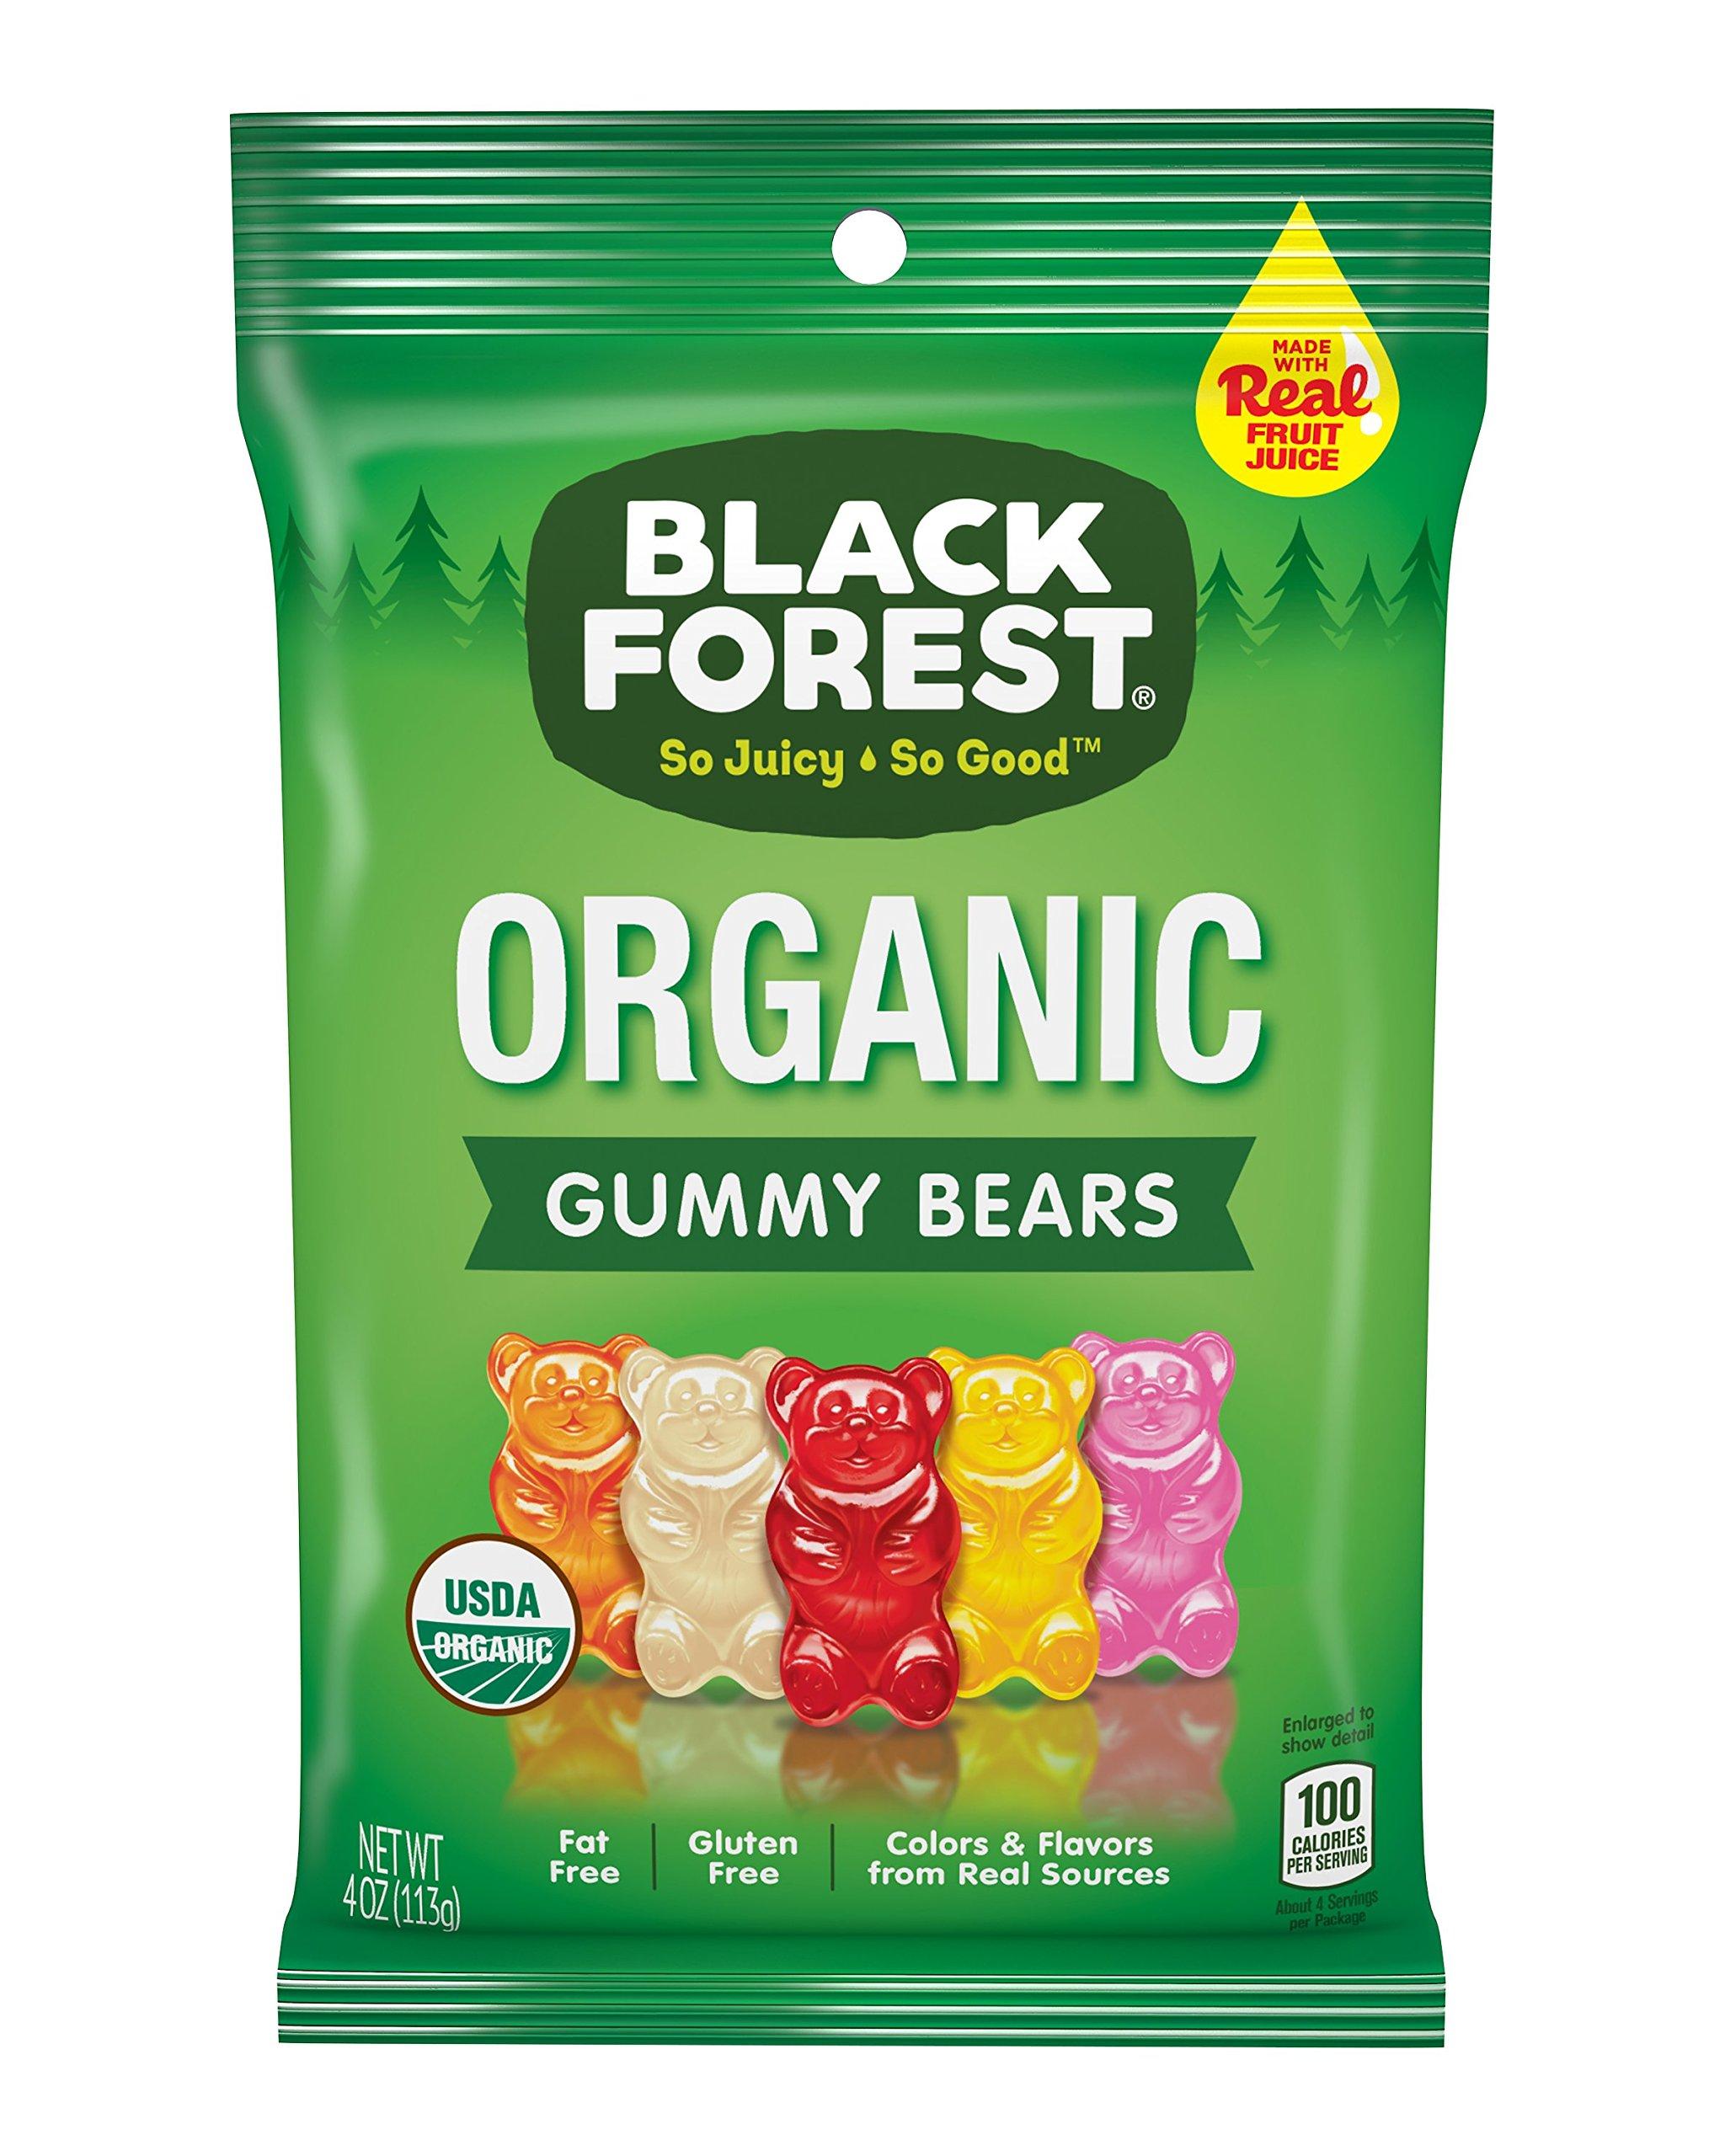 Black Forest Organic Gummy Bears Candy, 4 oz Bag, Pack of 12 by Black Forest Organic